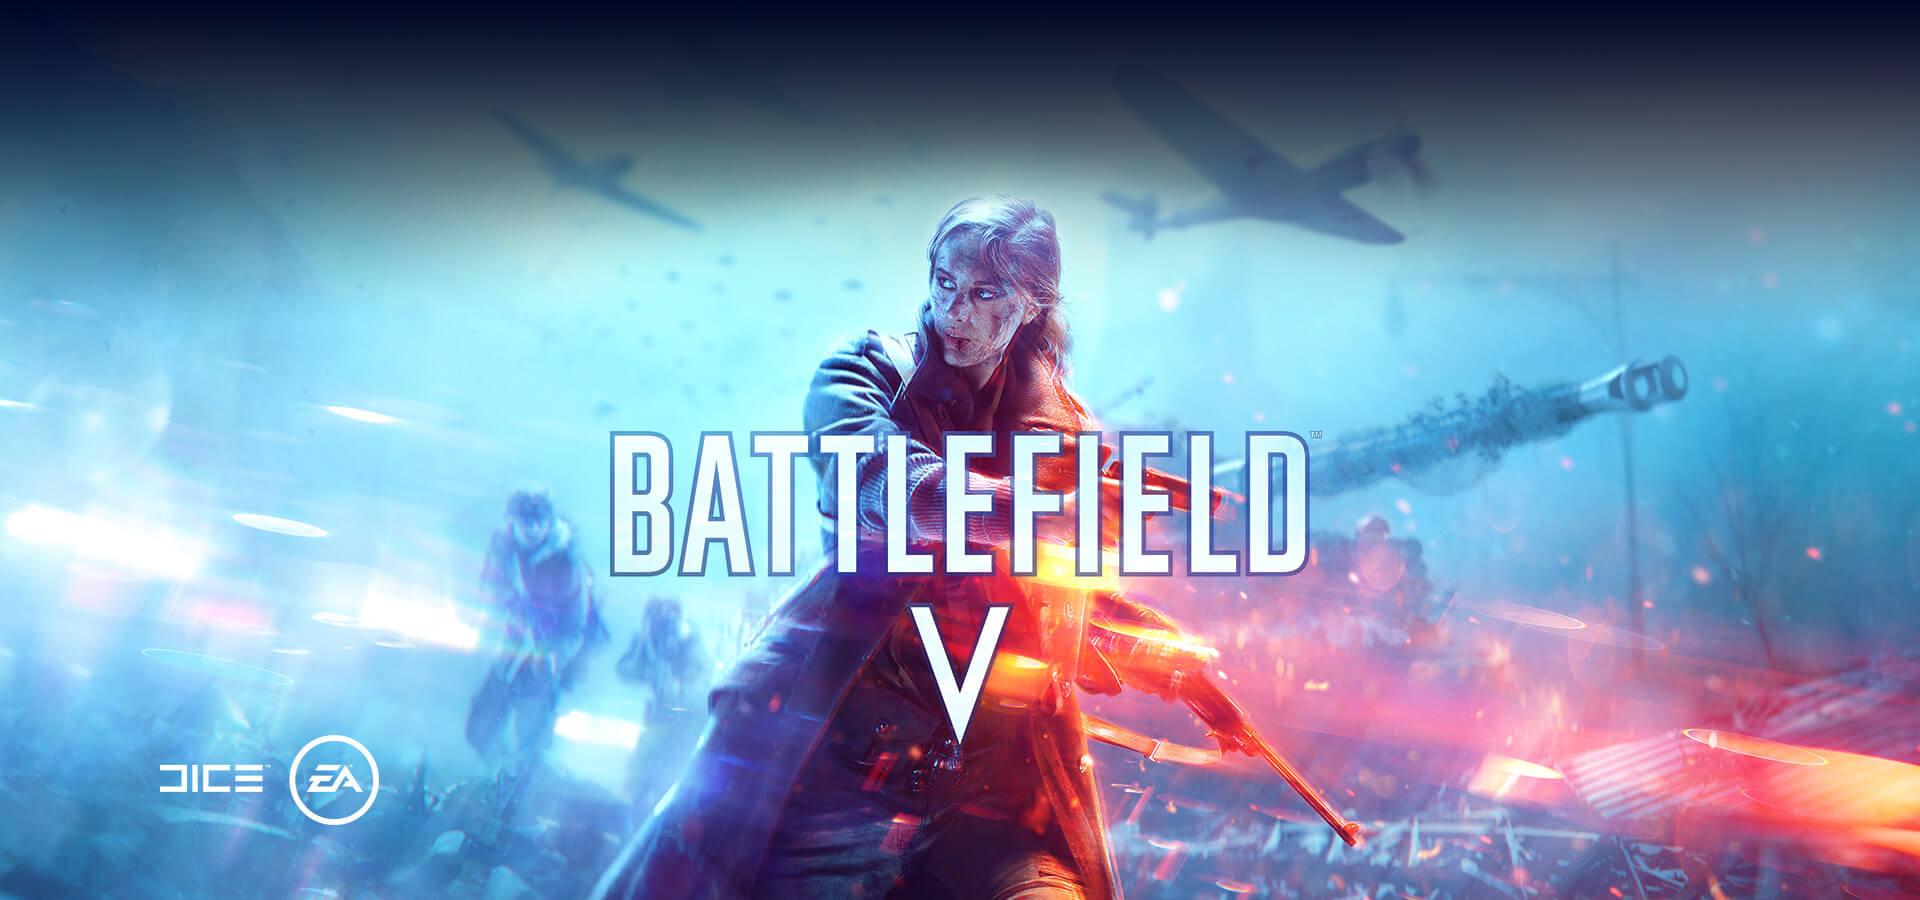 battlefeild v